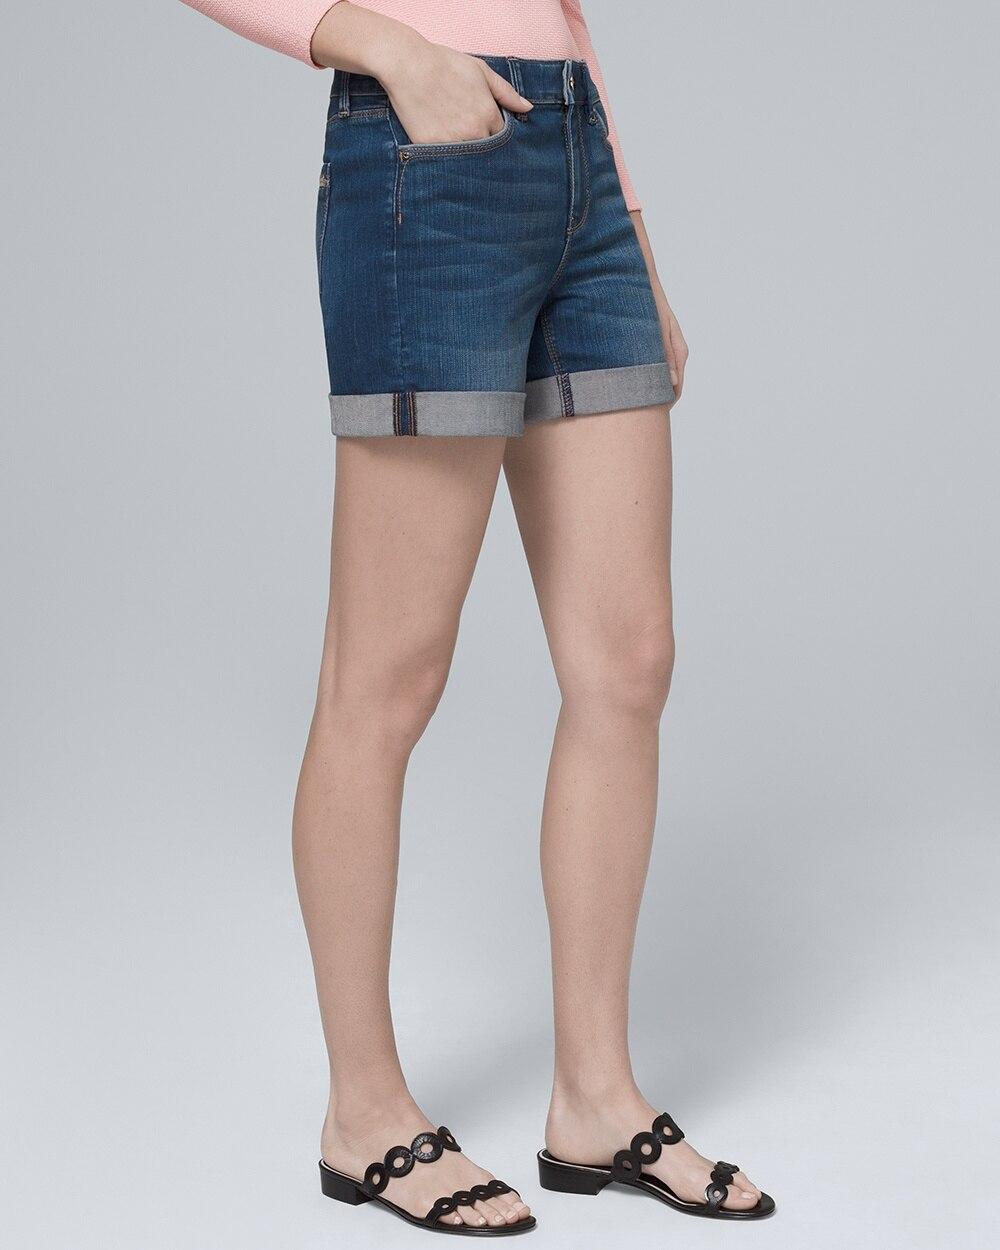 922141fc72 5-inch Denim Shorts - White House Black Market